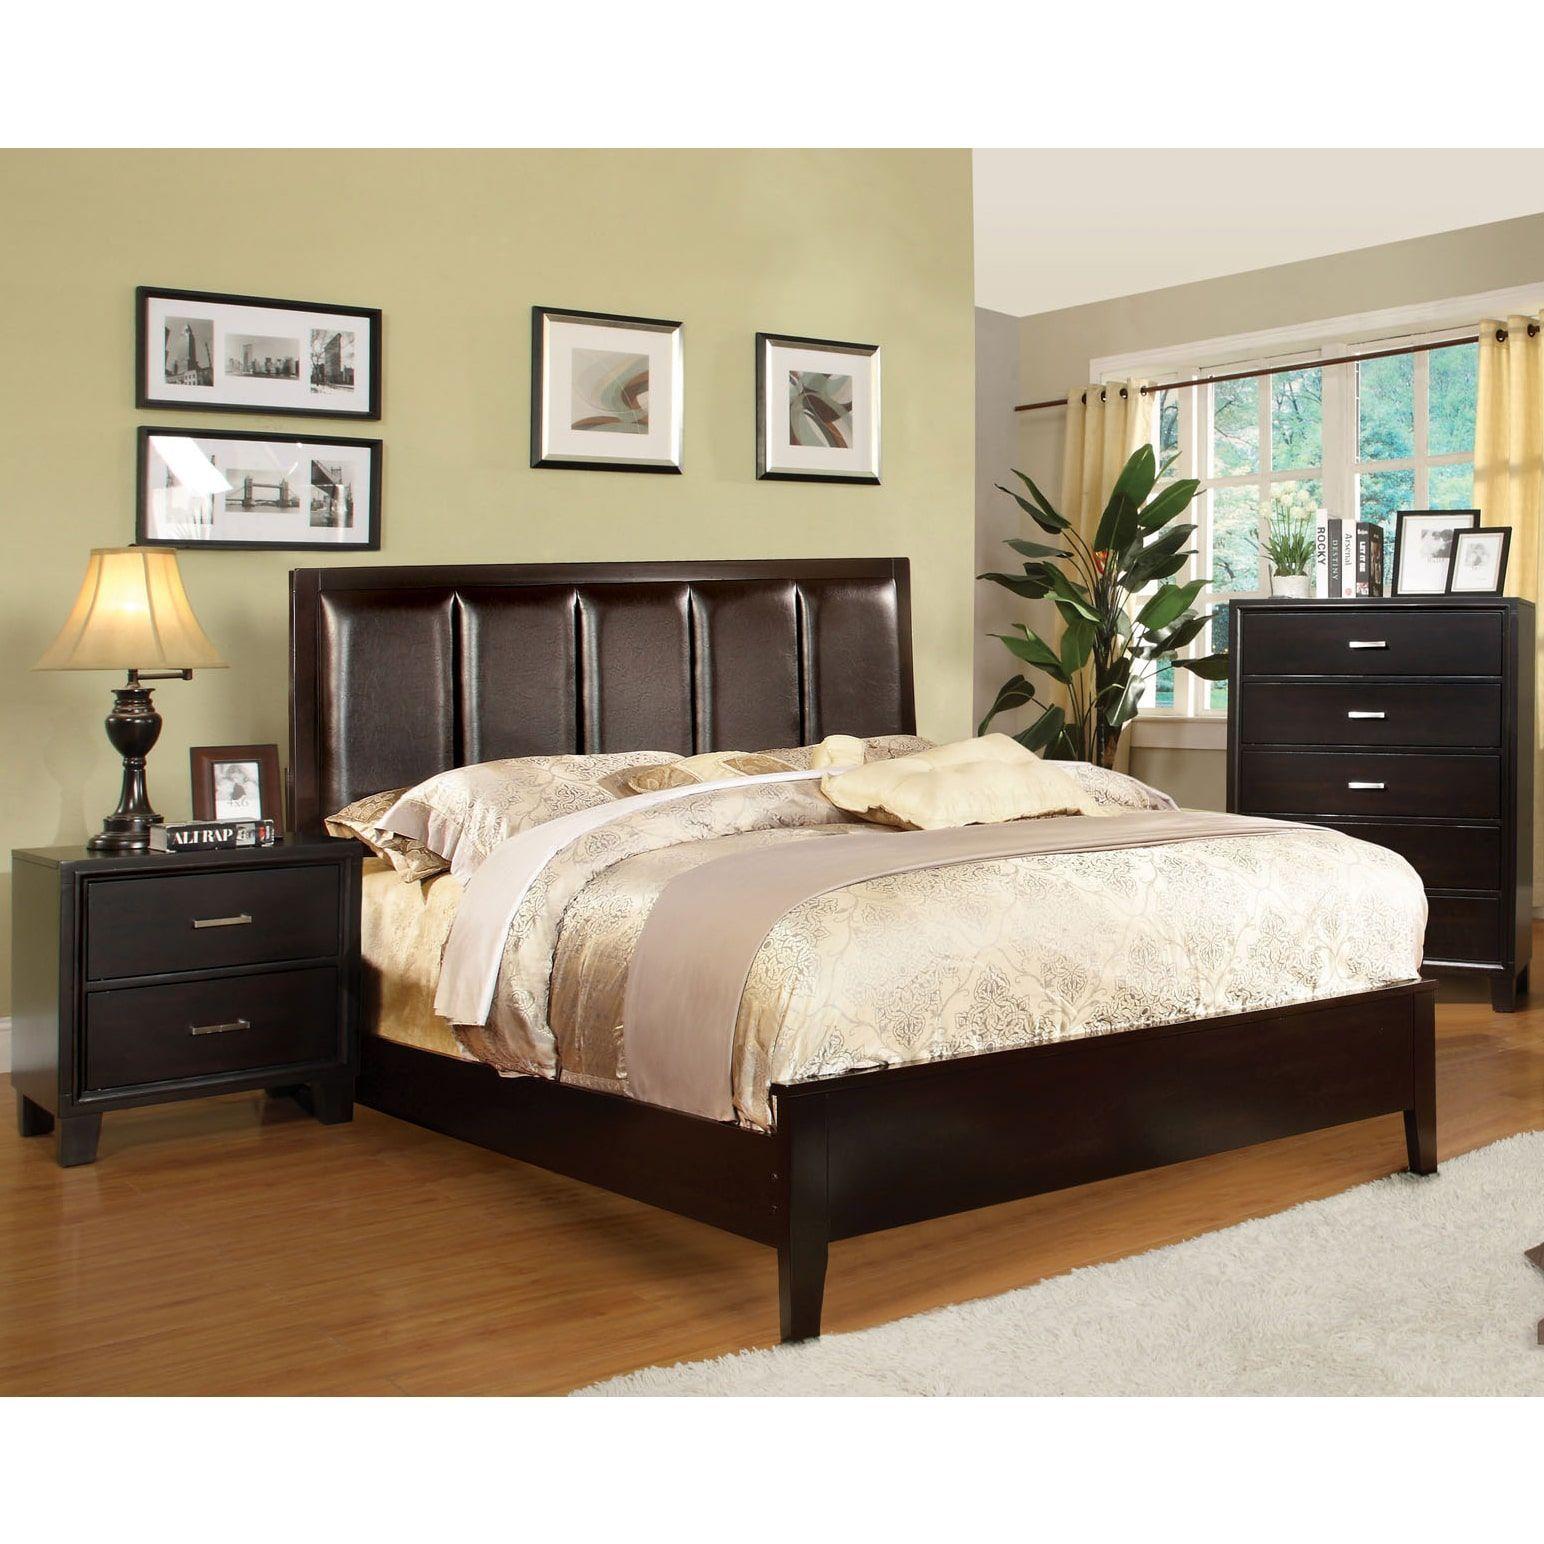 Furniture of america rafael contemporary piece bedroom set cal